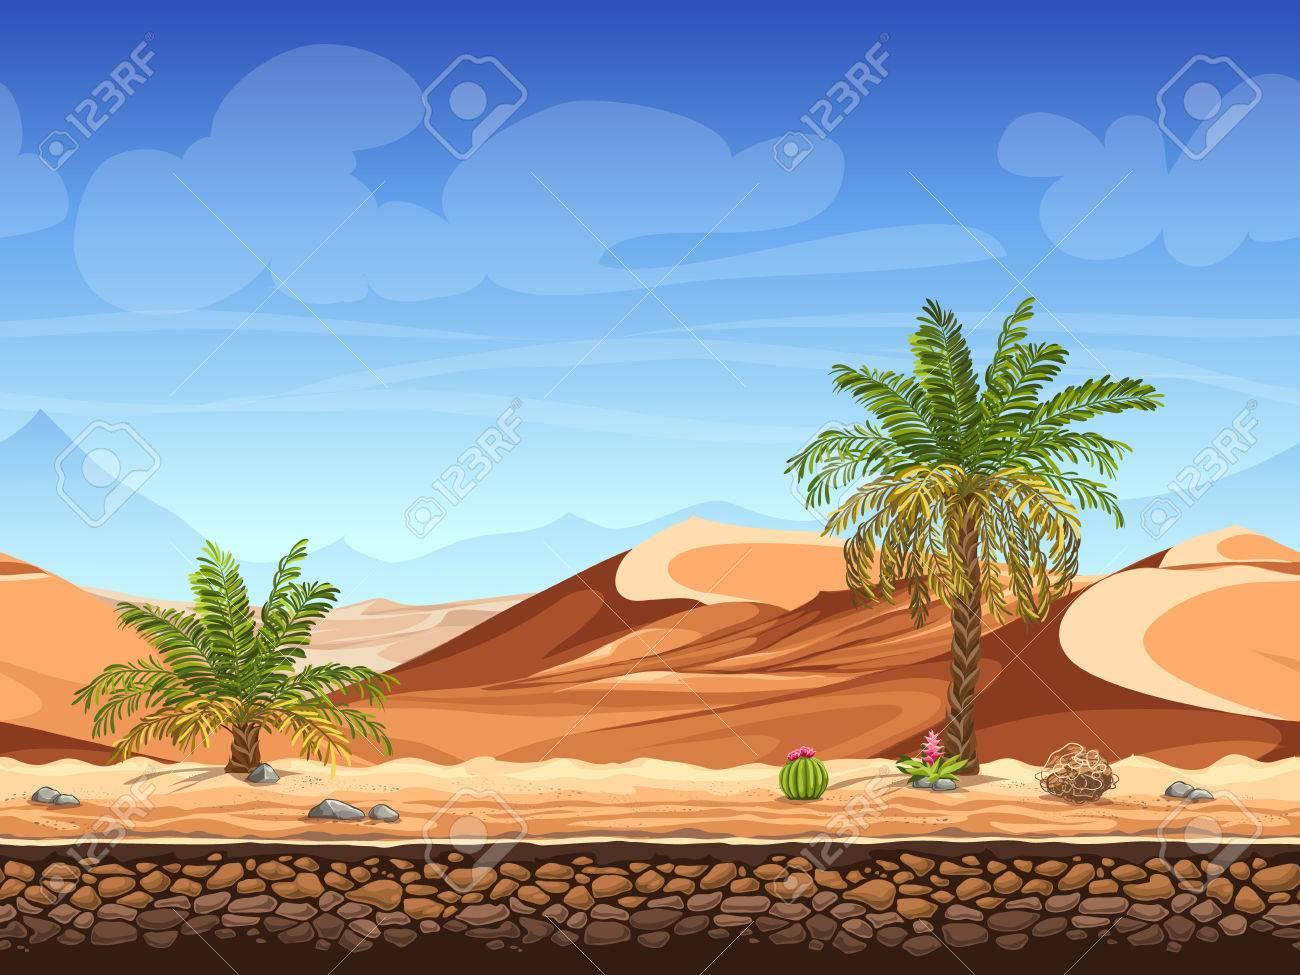 Vector illustration - seamless background - palm trees in desert - for game design - 51305170